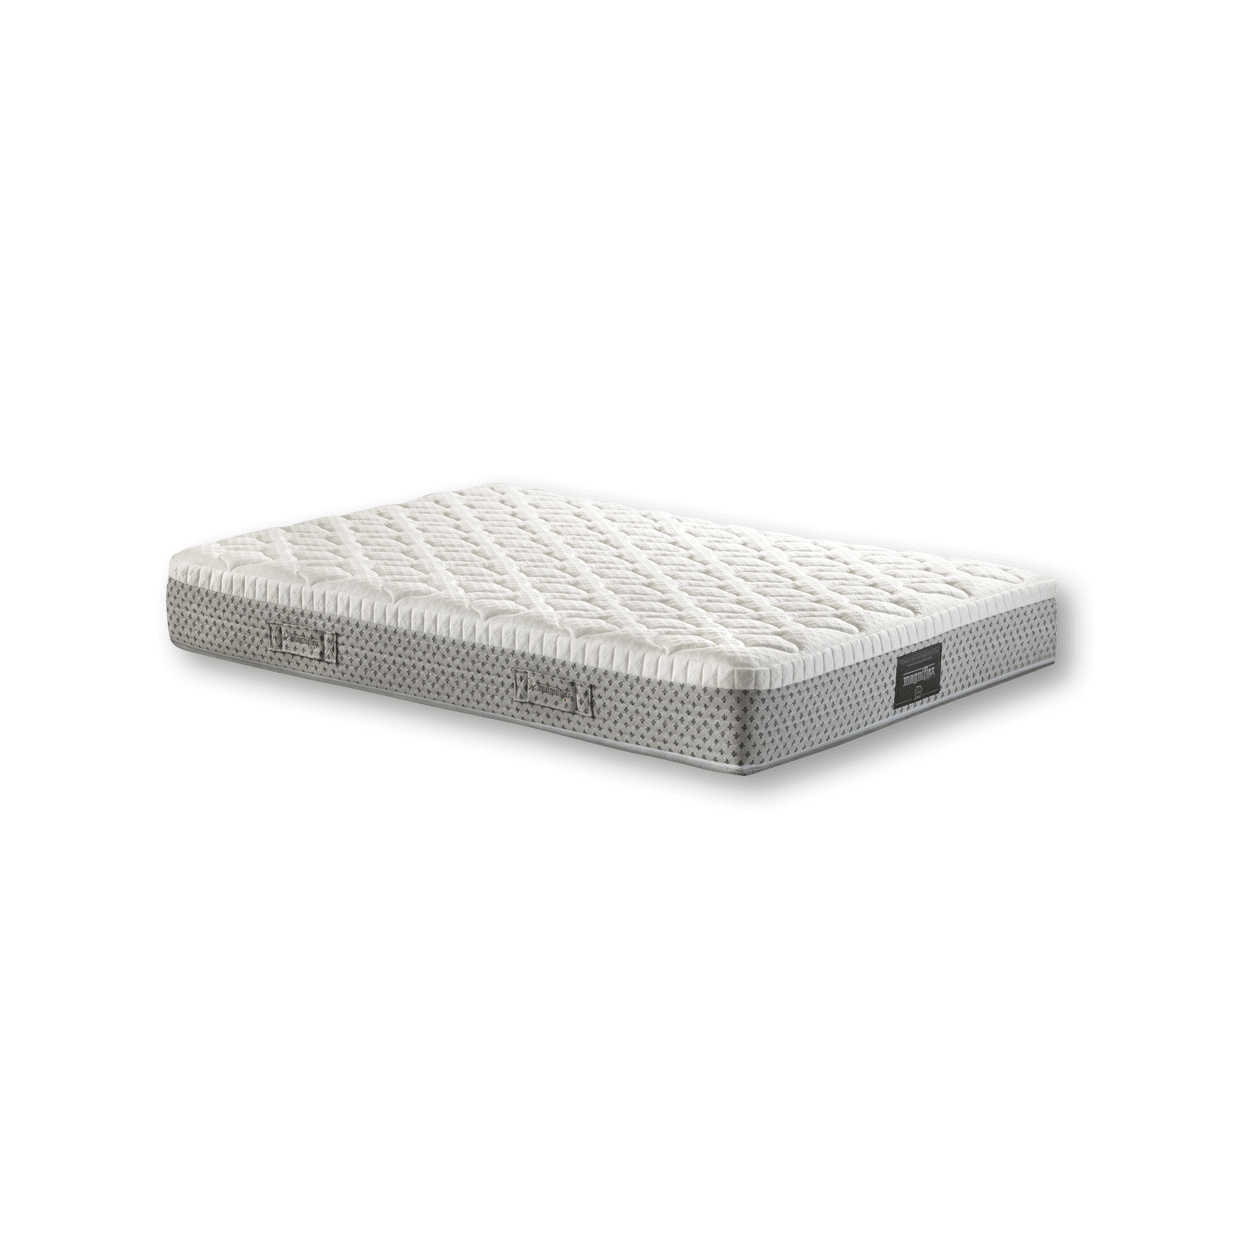 Comfort dual матрак, от Magniflex